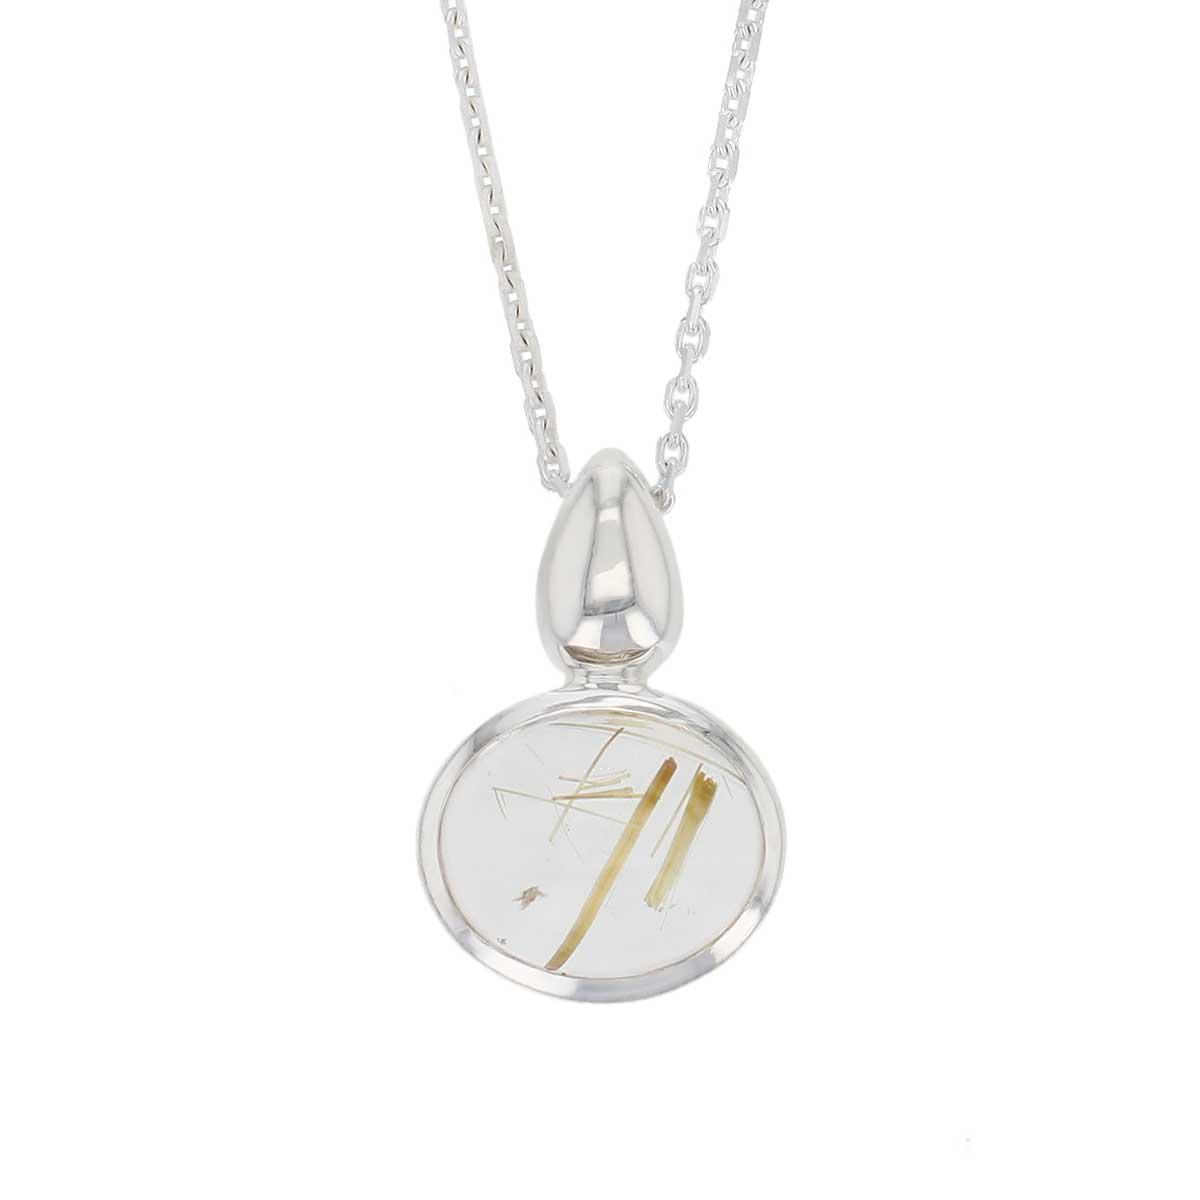 sterling silver oval cut cabochon golden rutile quartz gemstone dress pendant, designer jewellery, yellow rutilated quartz gem, jewelry, handmade by Faller, Londonderry, Northern Ireland, Irish hand crafted, darcy, D'arcy